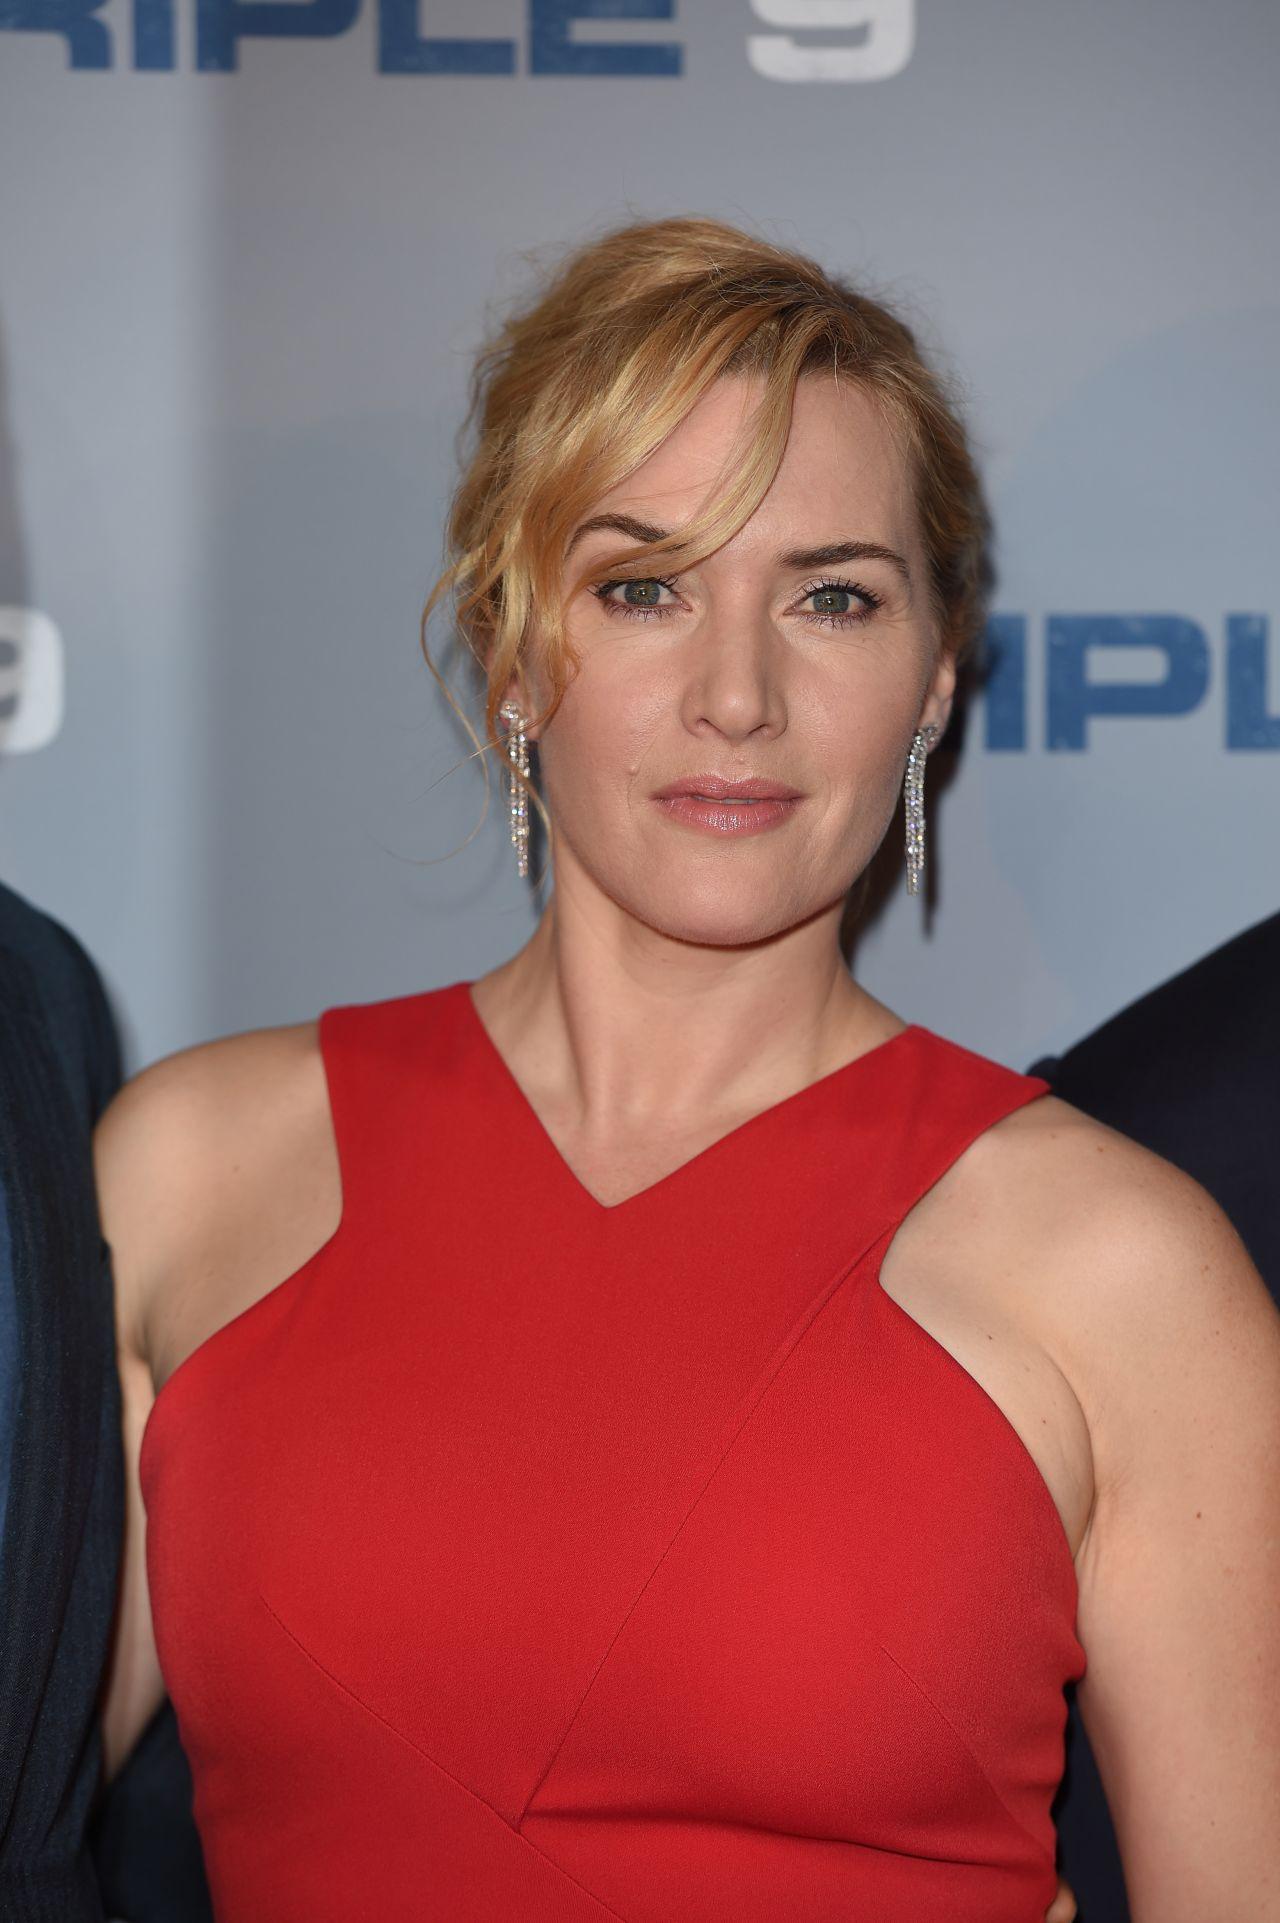 Kate Winslet - 'Triple 9' Special Screening in London Kate Winslet